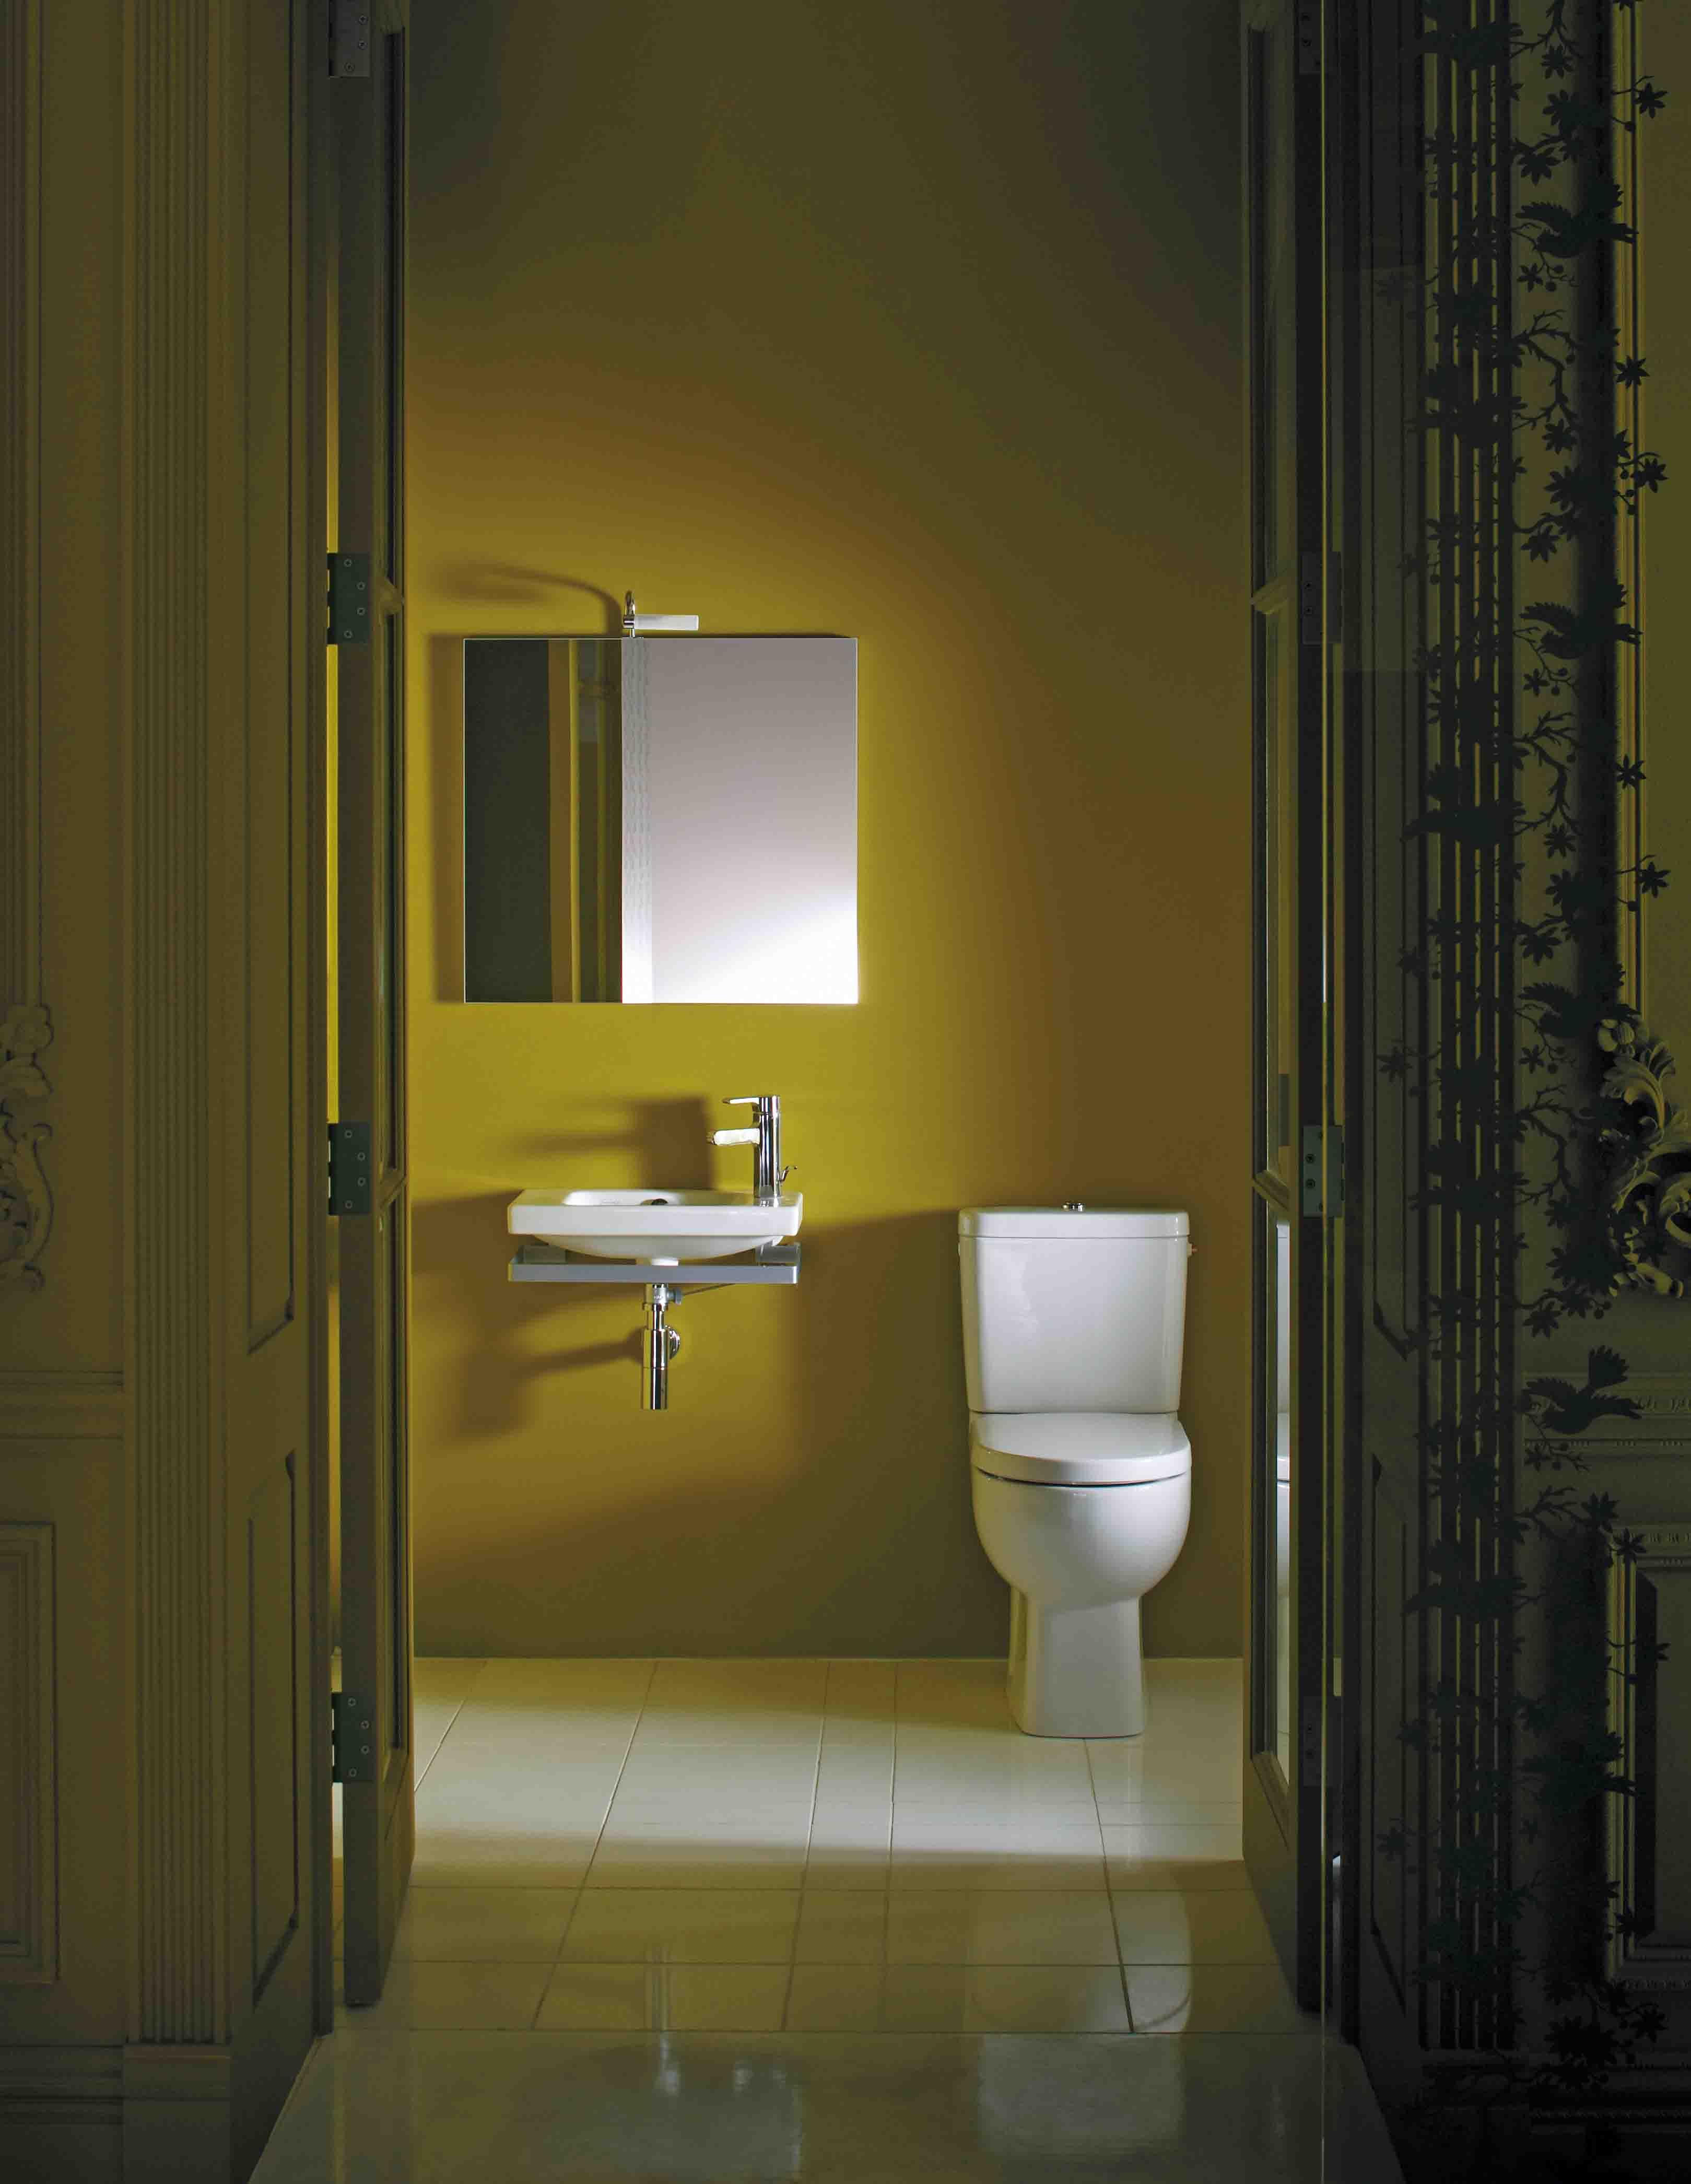 Latest Bathroom Basins Are Both Space Saving And Beautiful